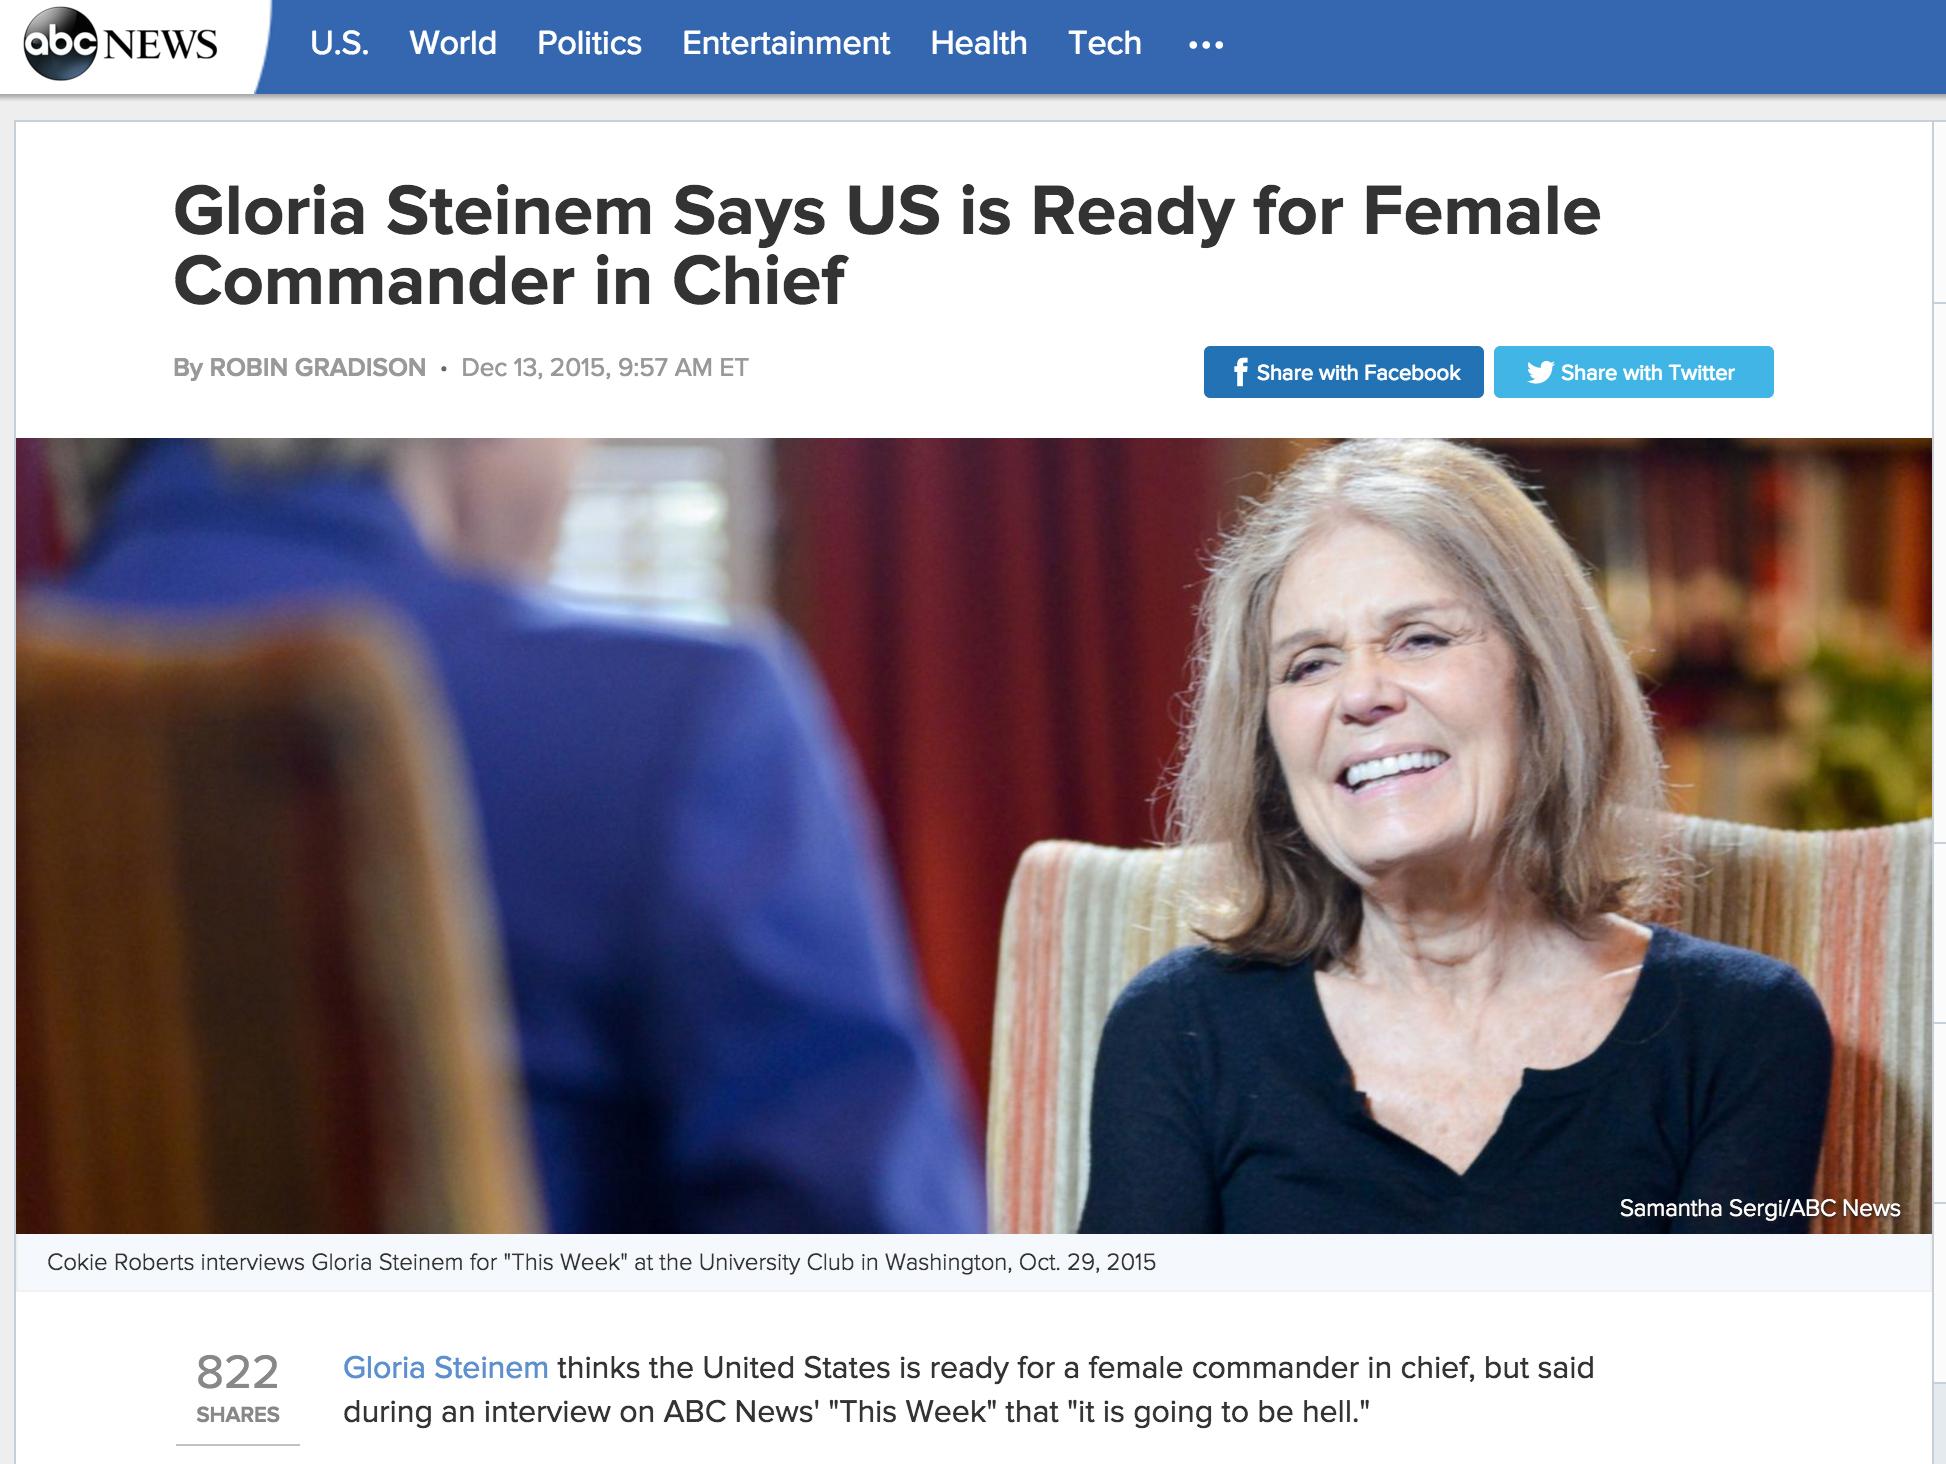 http://abcnews.go.com/Politics/gloria-steinem-us-ready-female-commander-chief/story?id=35732215